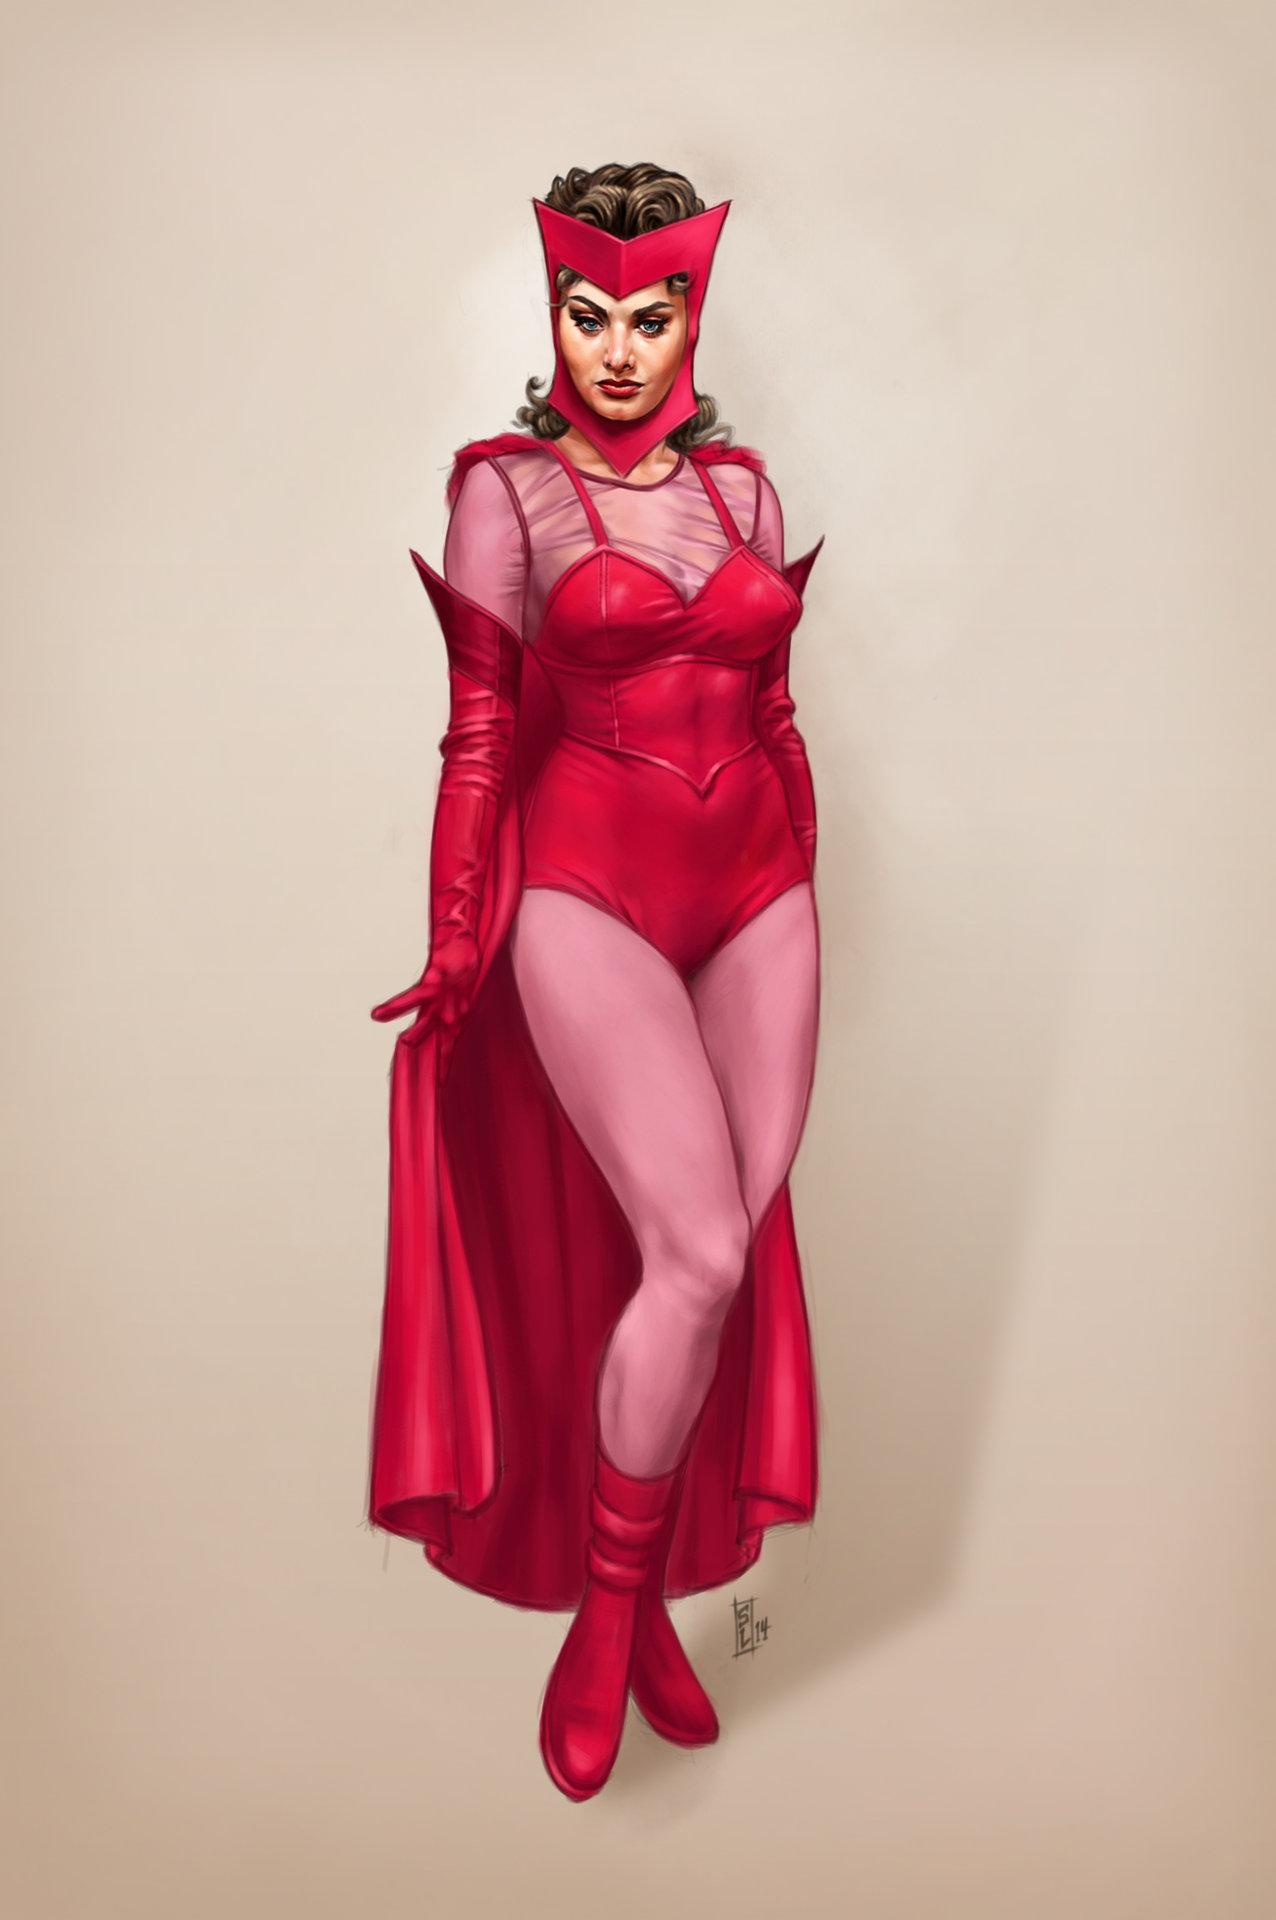 classy-female-superhero-pin-up-art-by-stephen-langmead6